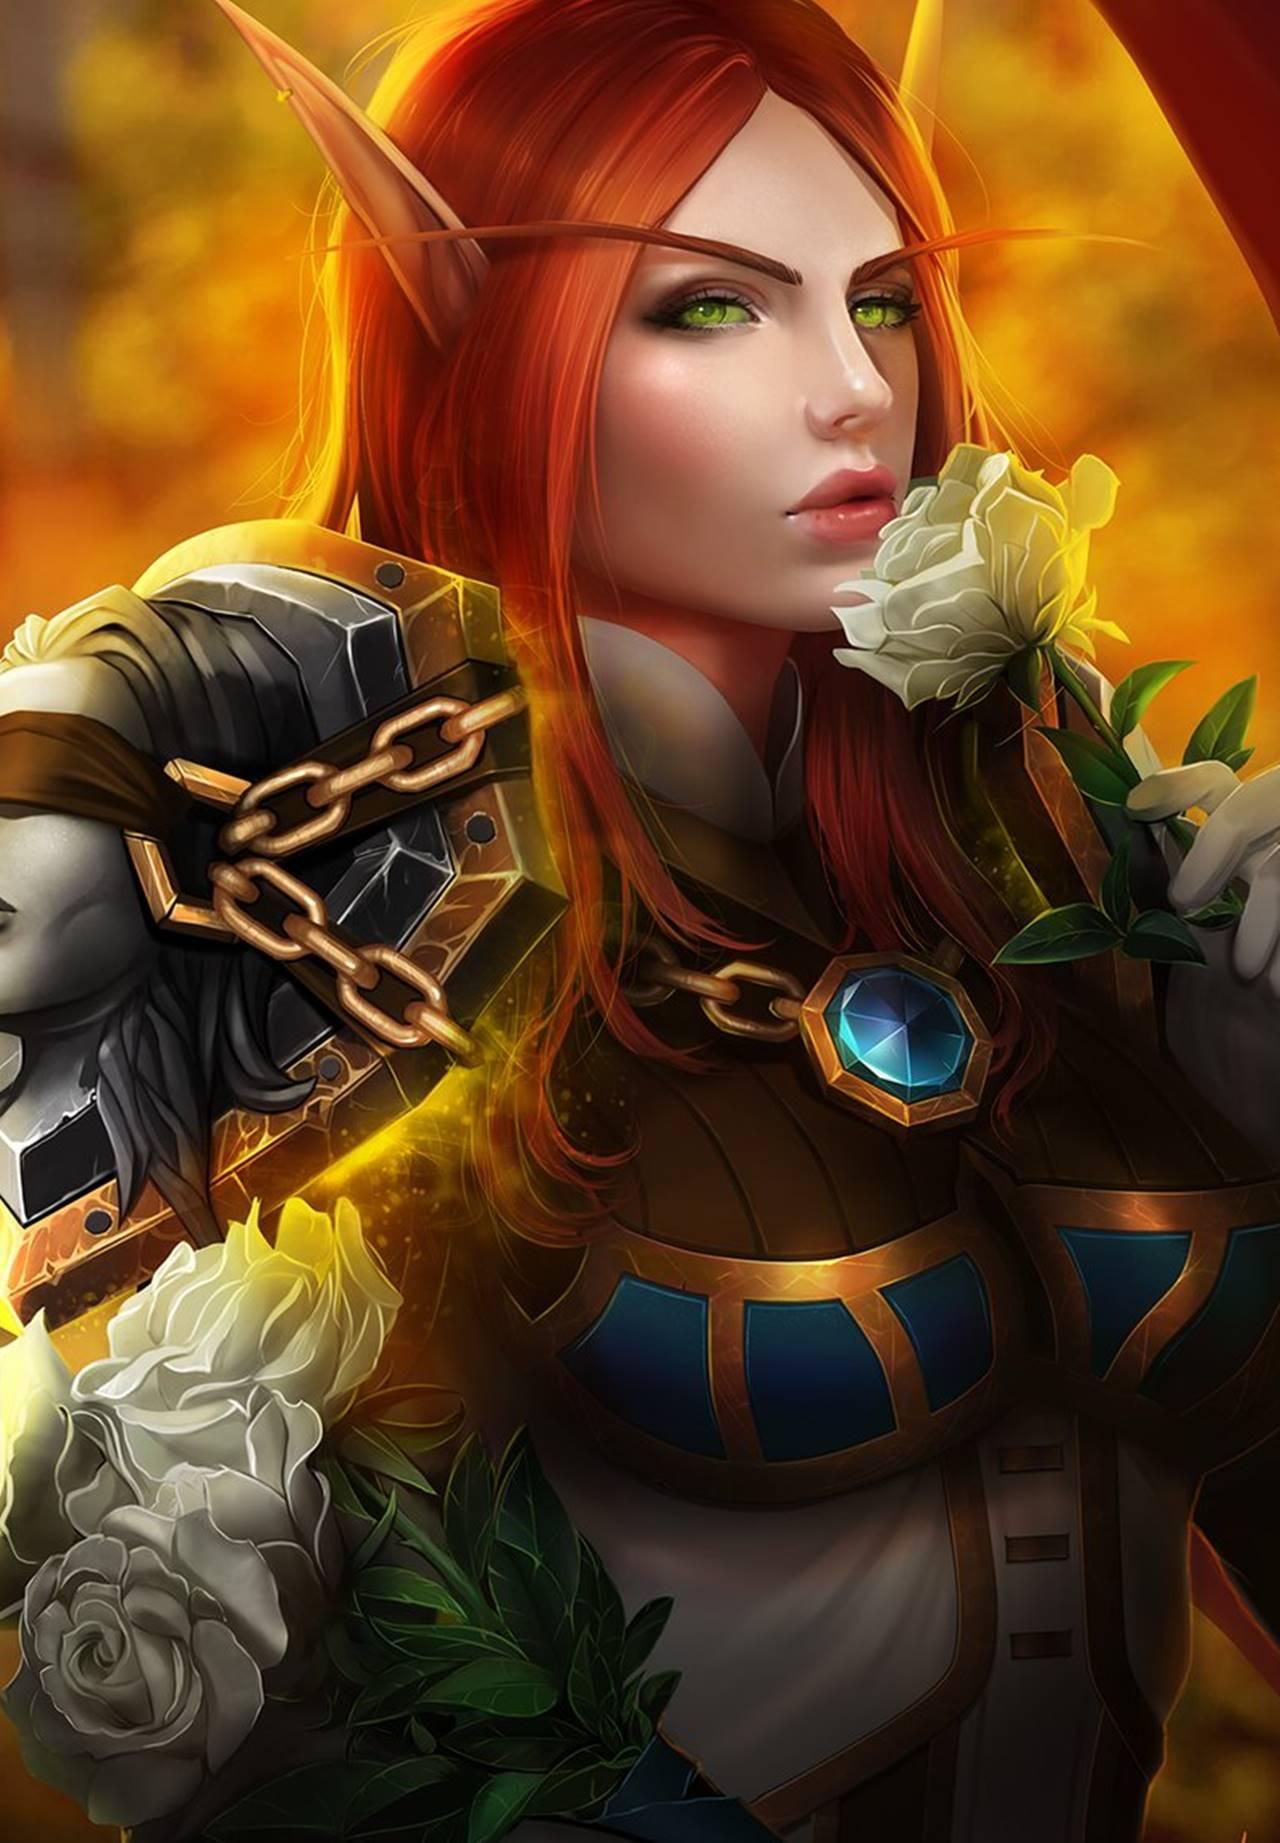 World of Warcraft Legion эльфийка крови - World of Warcraft Арт, Персонаж